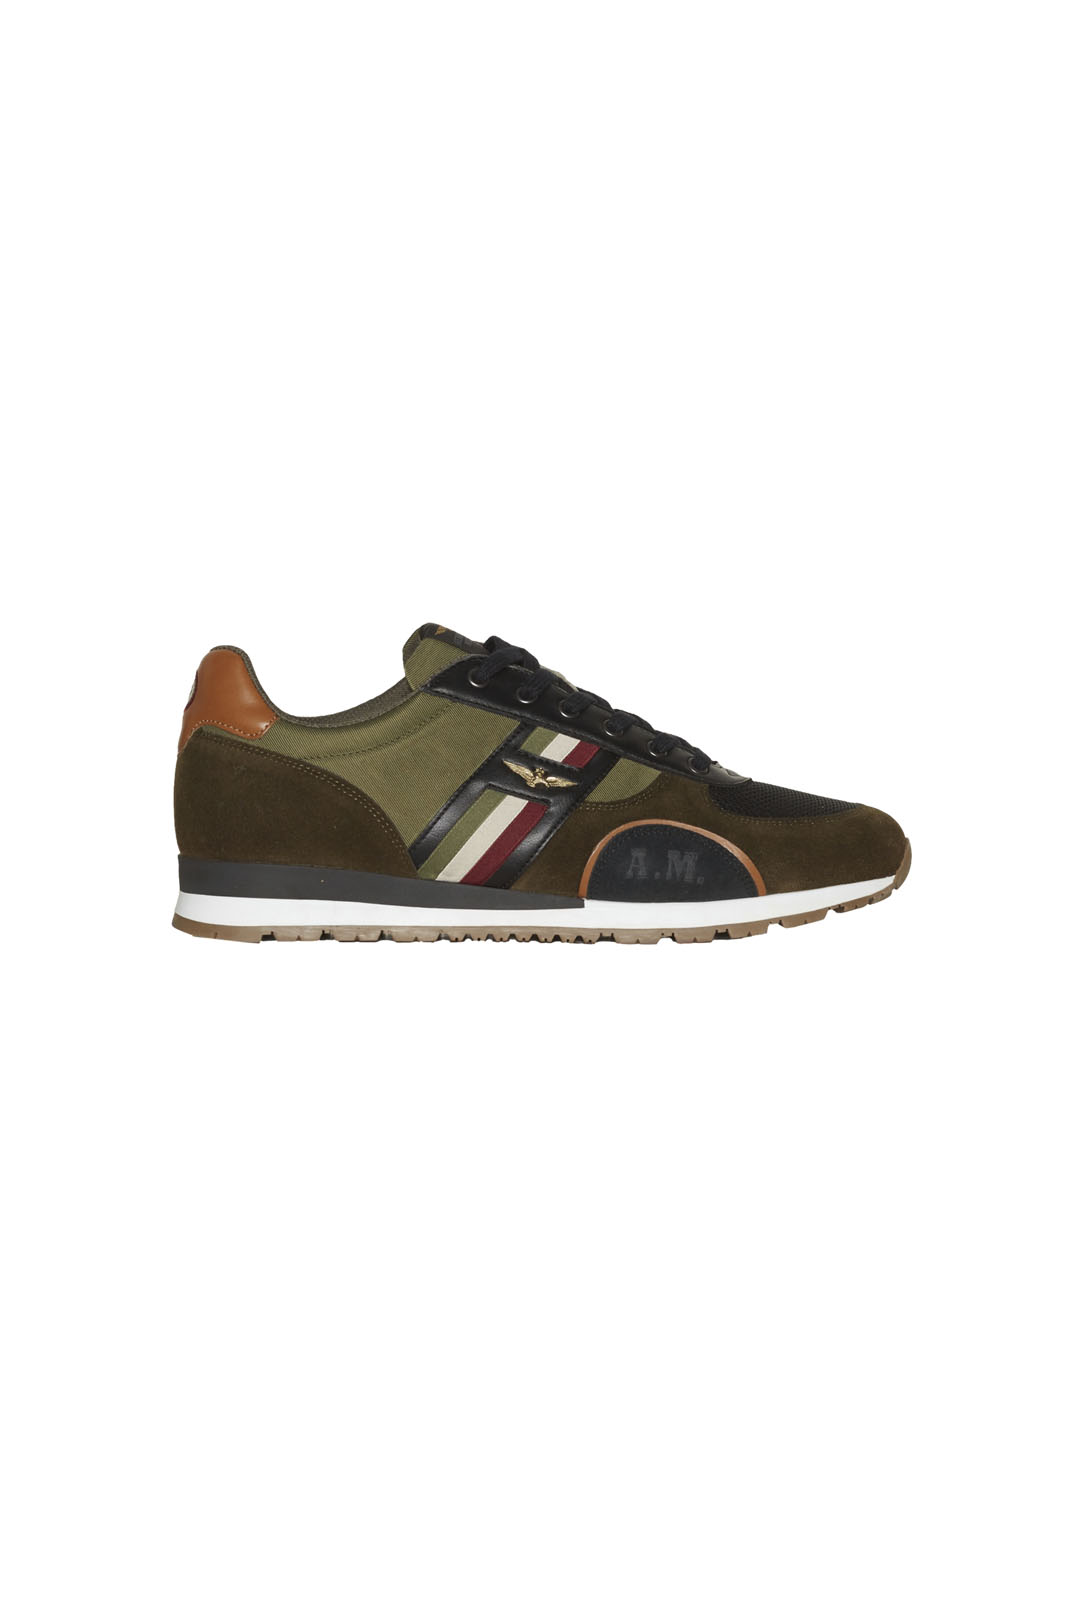 Sneakers mit Trikolor                    2